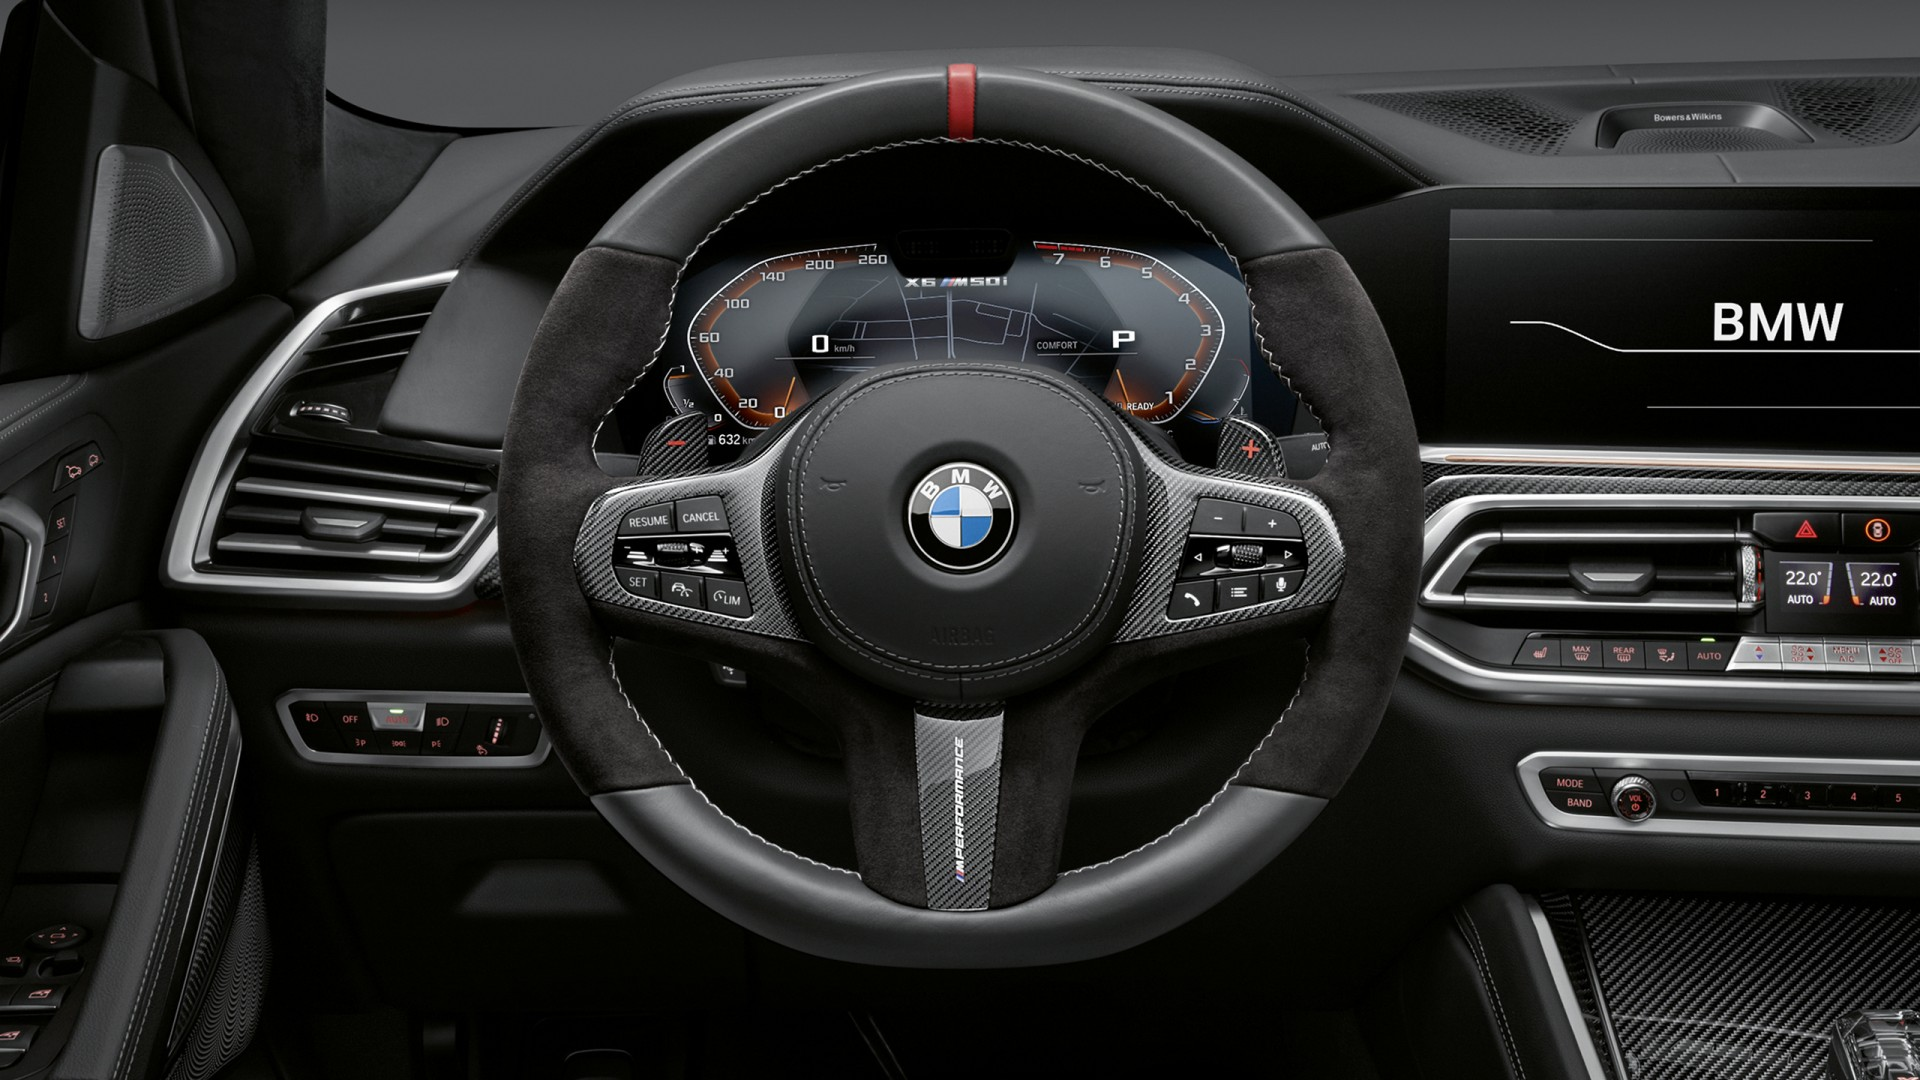 BMW X6 M Performance Parts 2019 Interior Wallpaper | HD